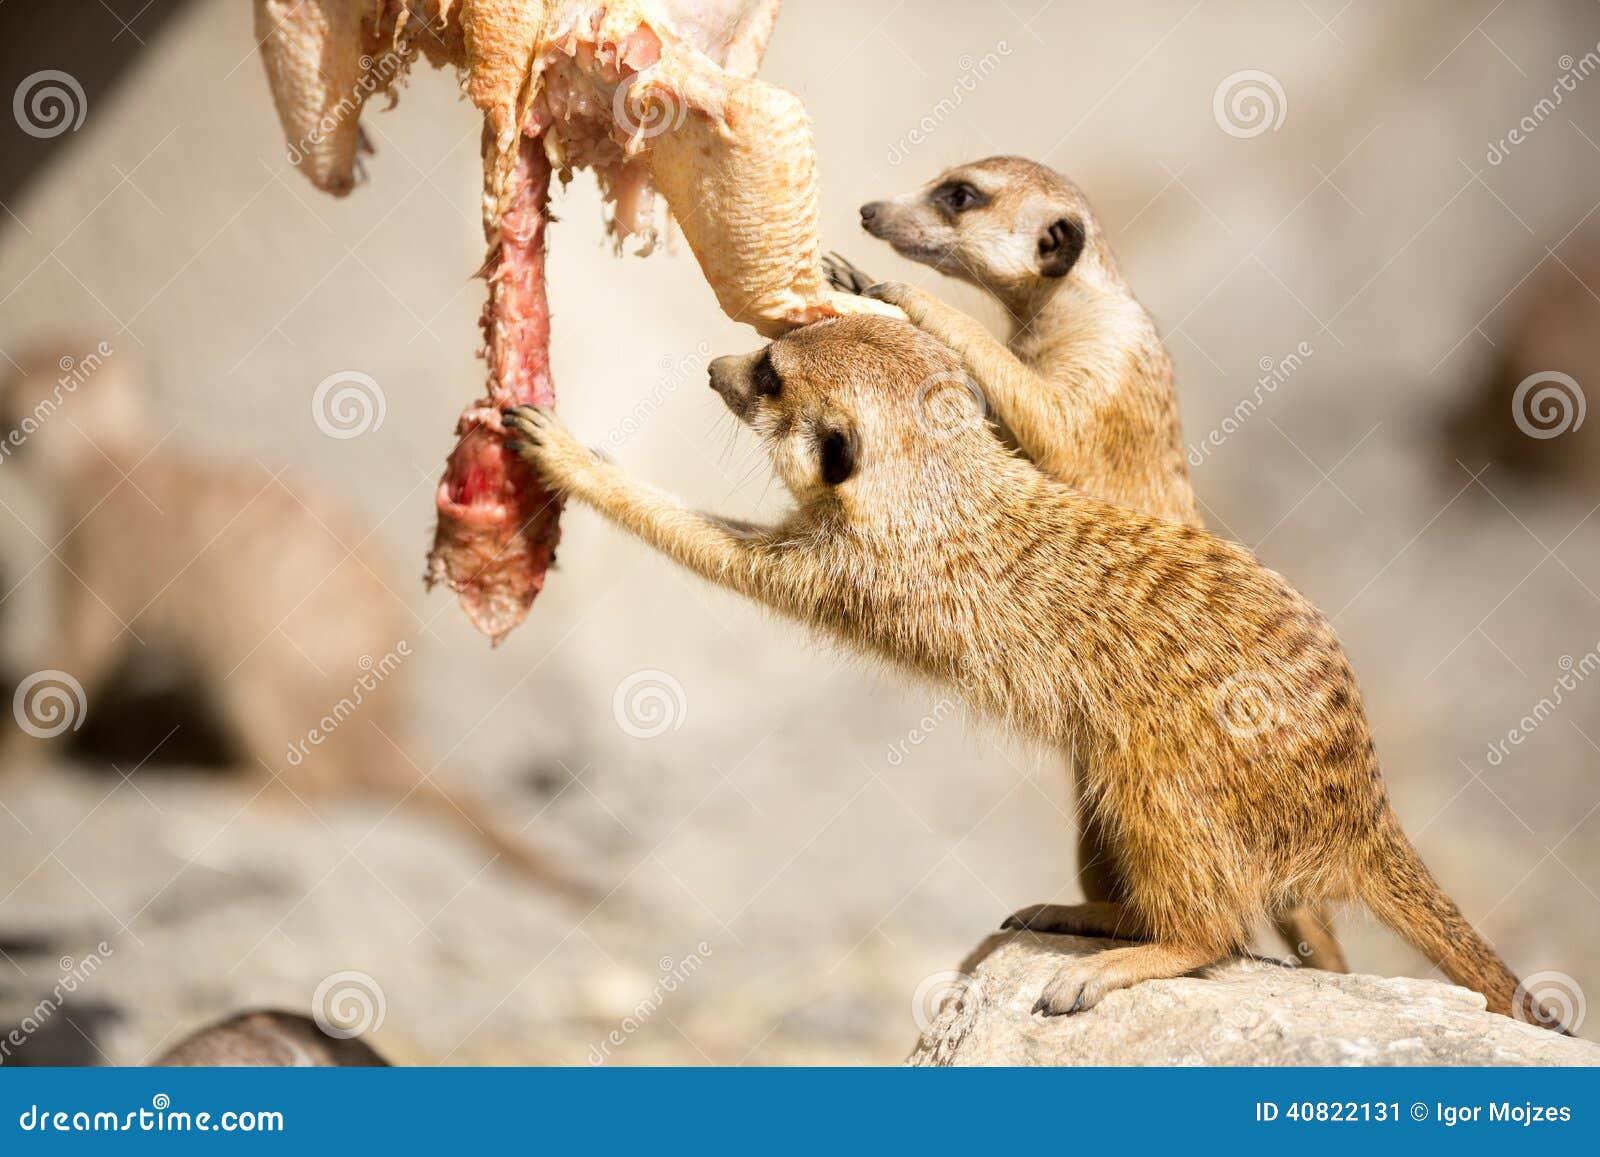 Meerkat eating snake - photo#24